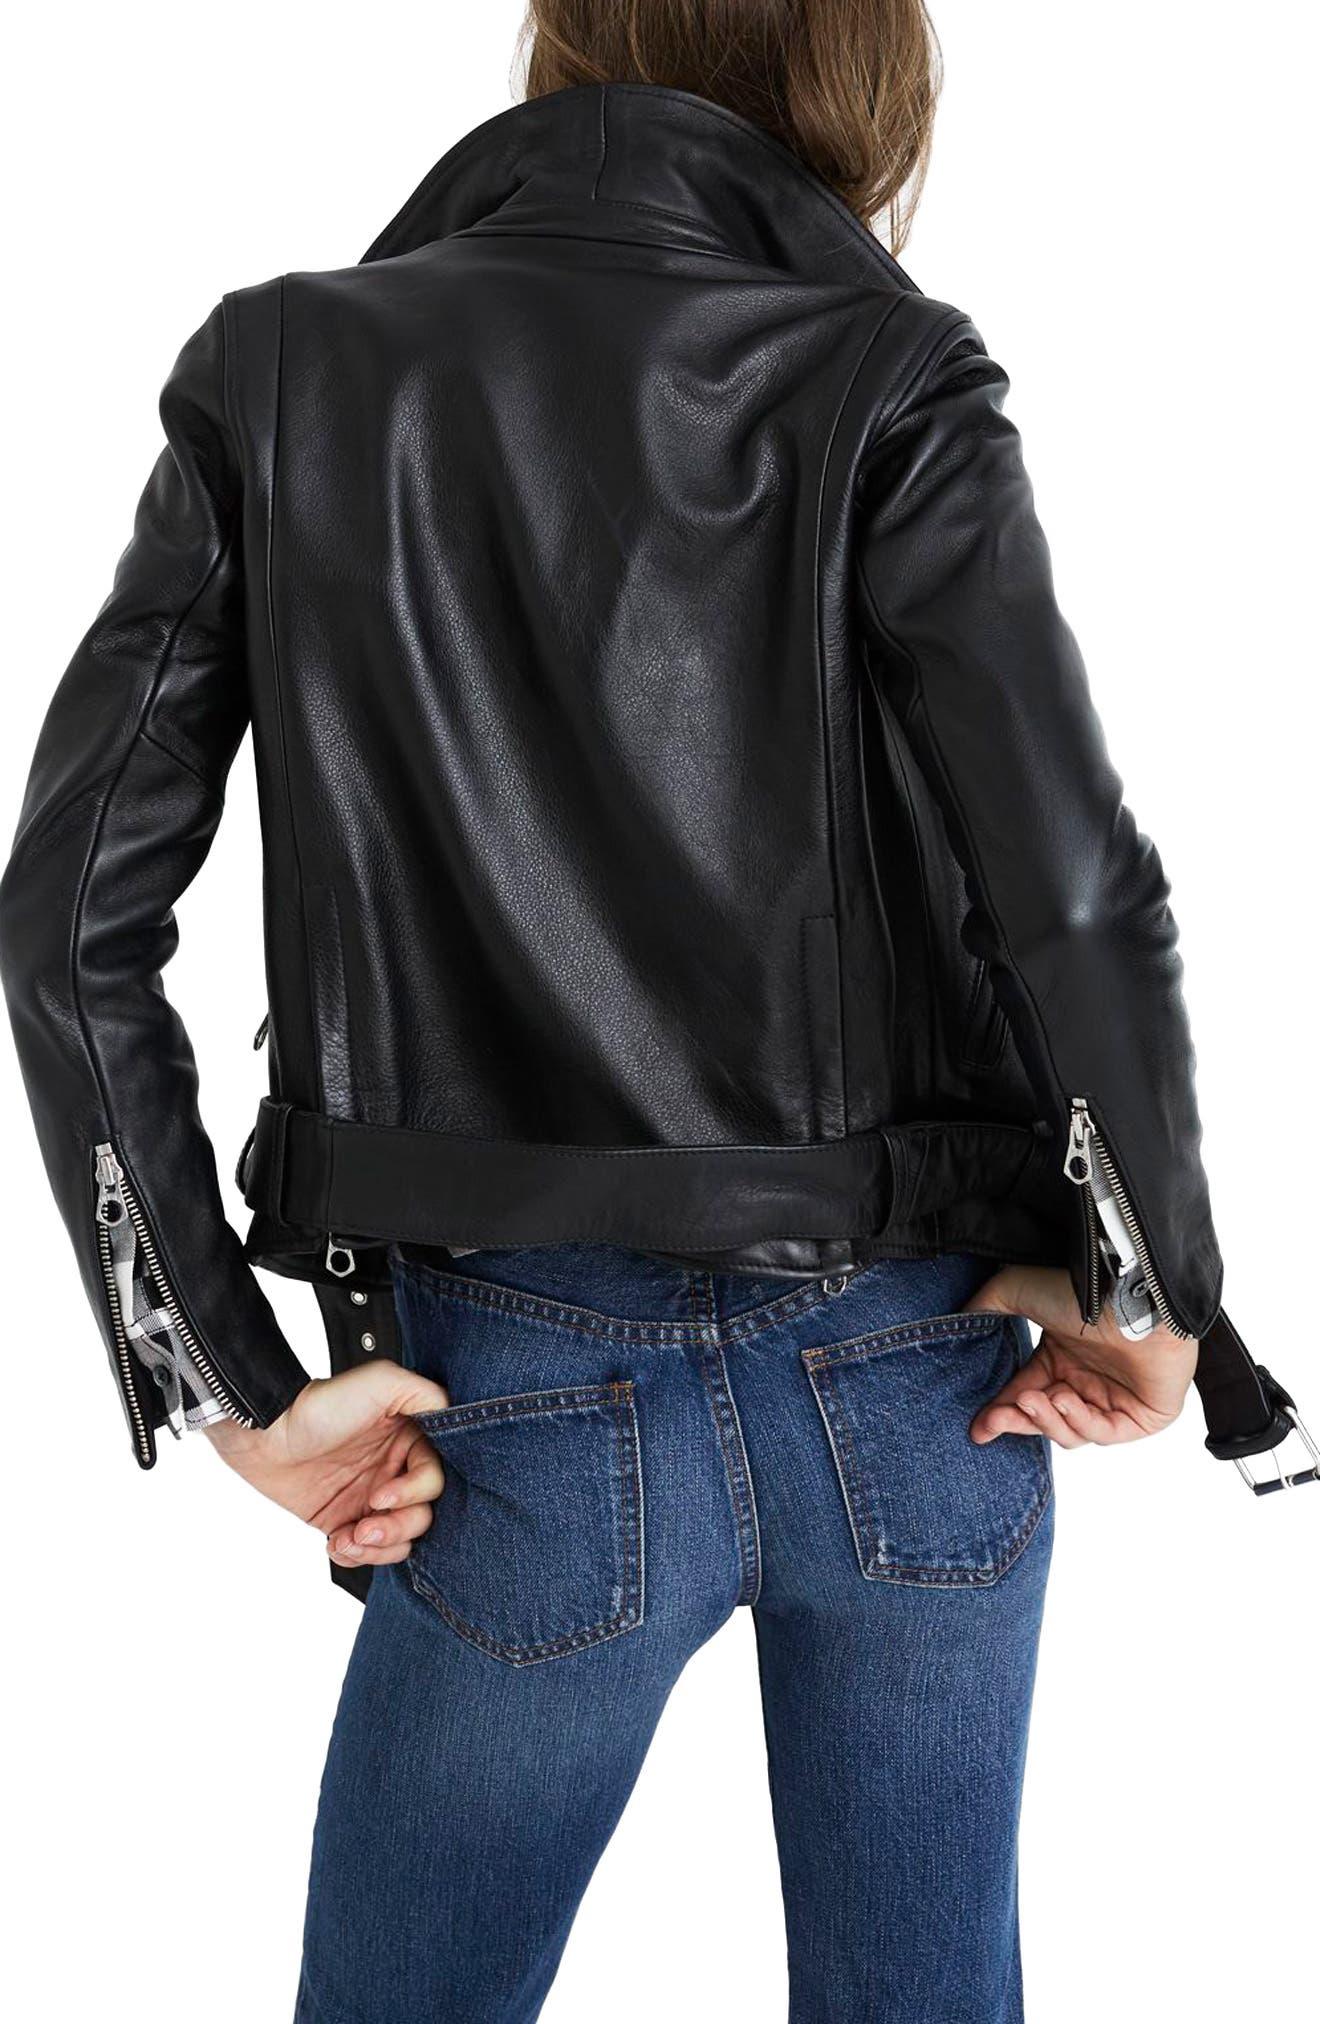 MADEWELL, Ultimate Leather Jacket, Alternate thumbnail 2, color, TRUE BLACK